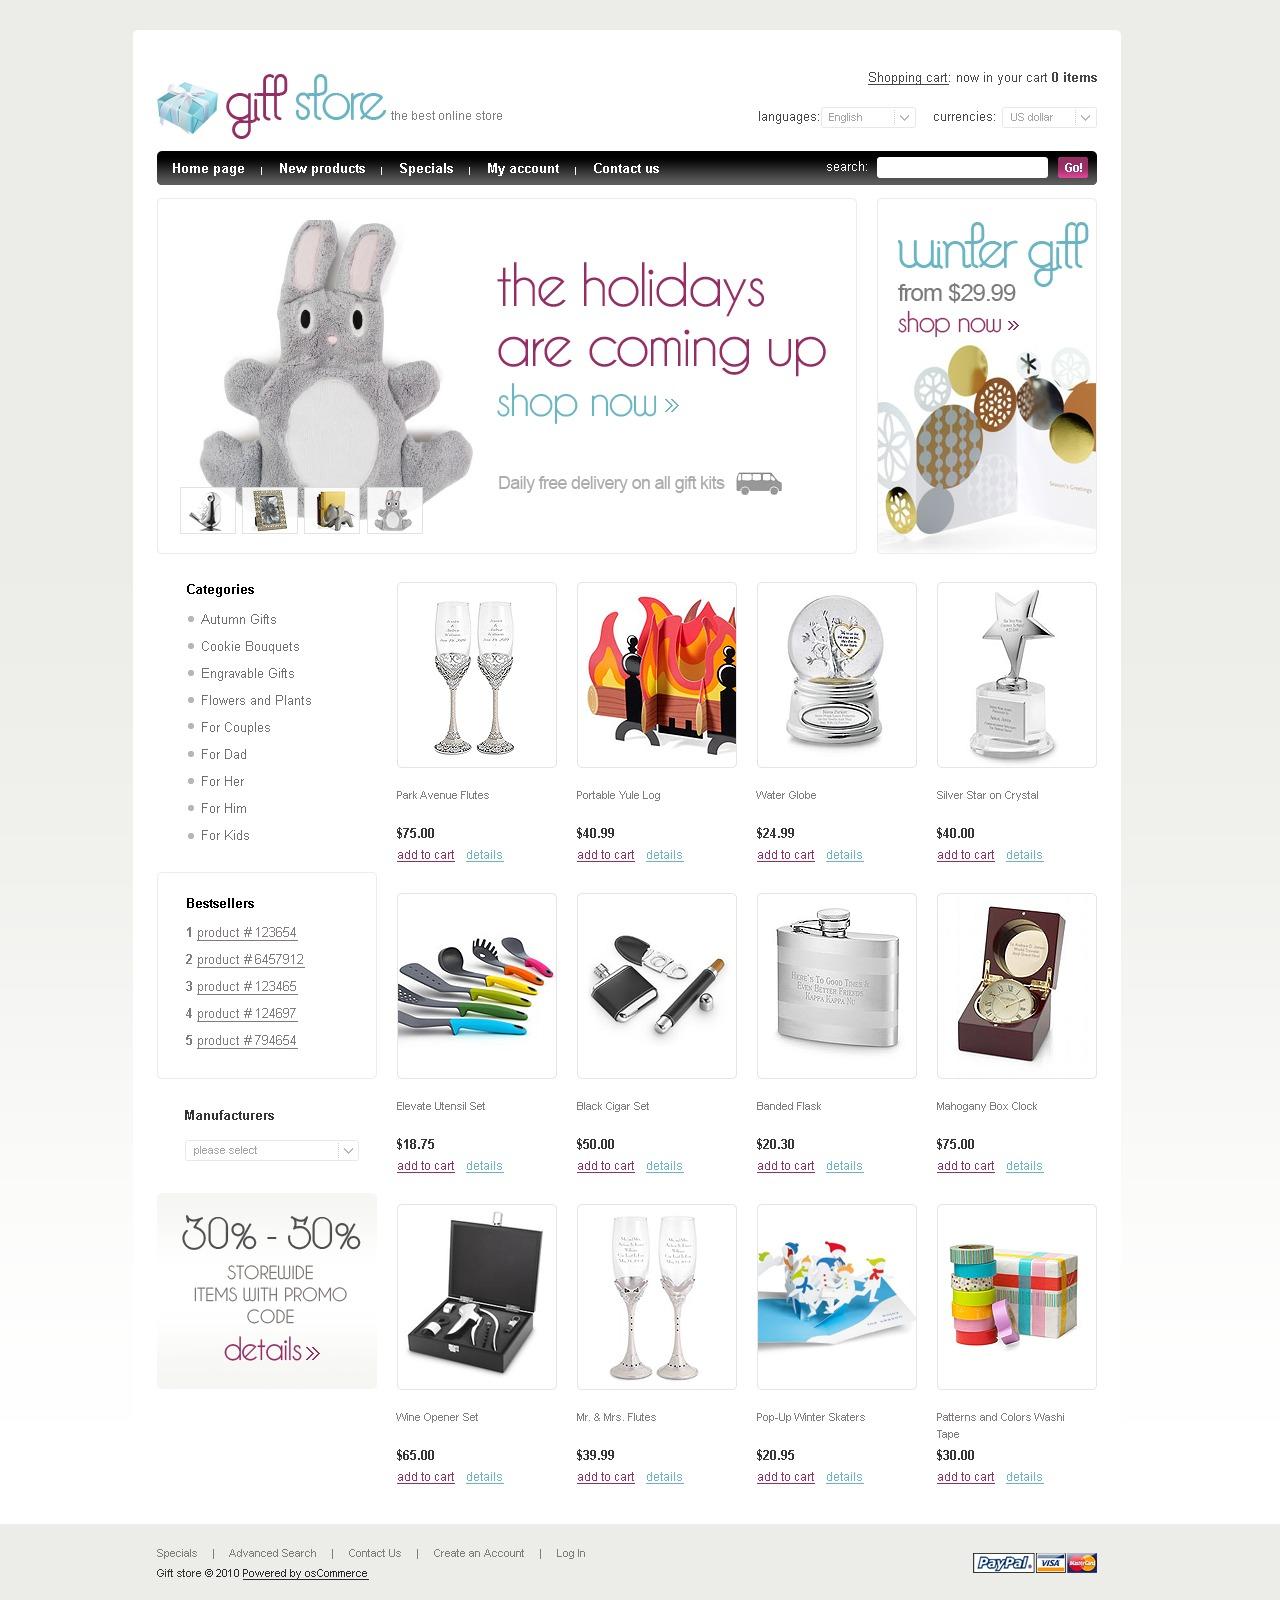 gifts store facebook flash template 33082. Black Bedroom Furniture Sets. Home Design Ideas